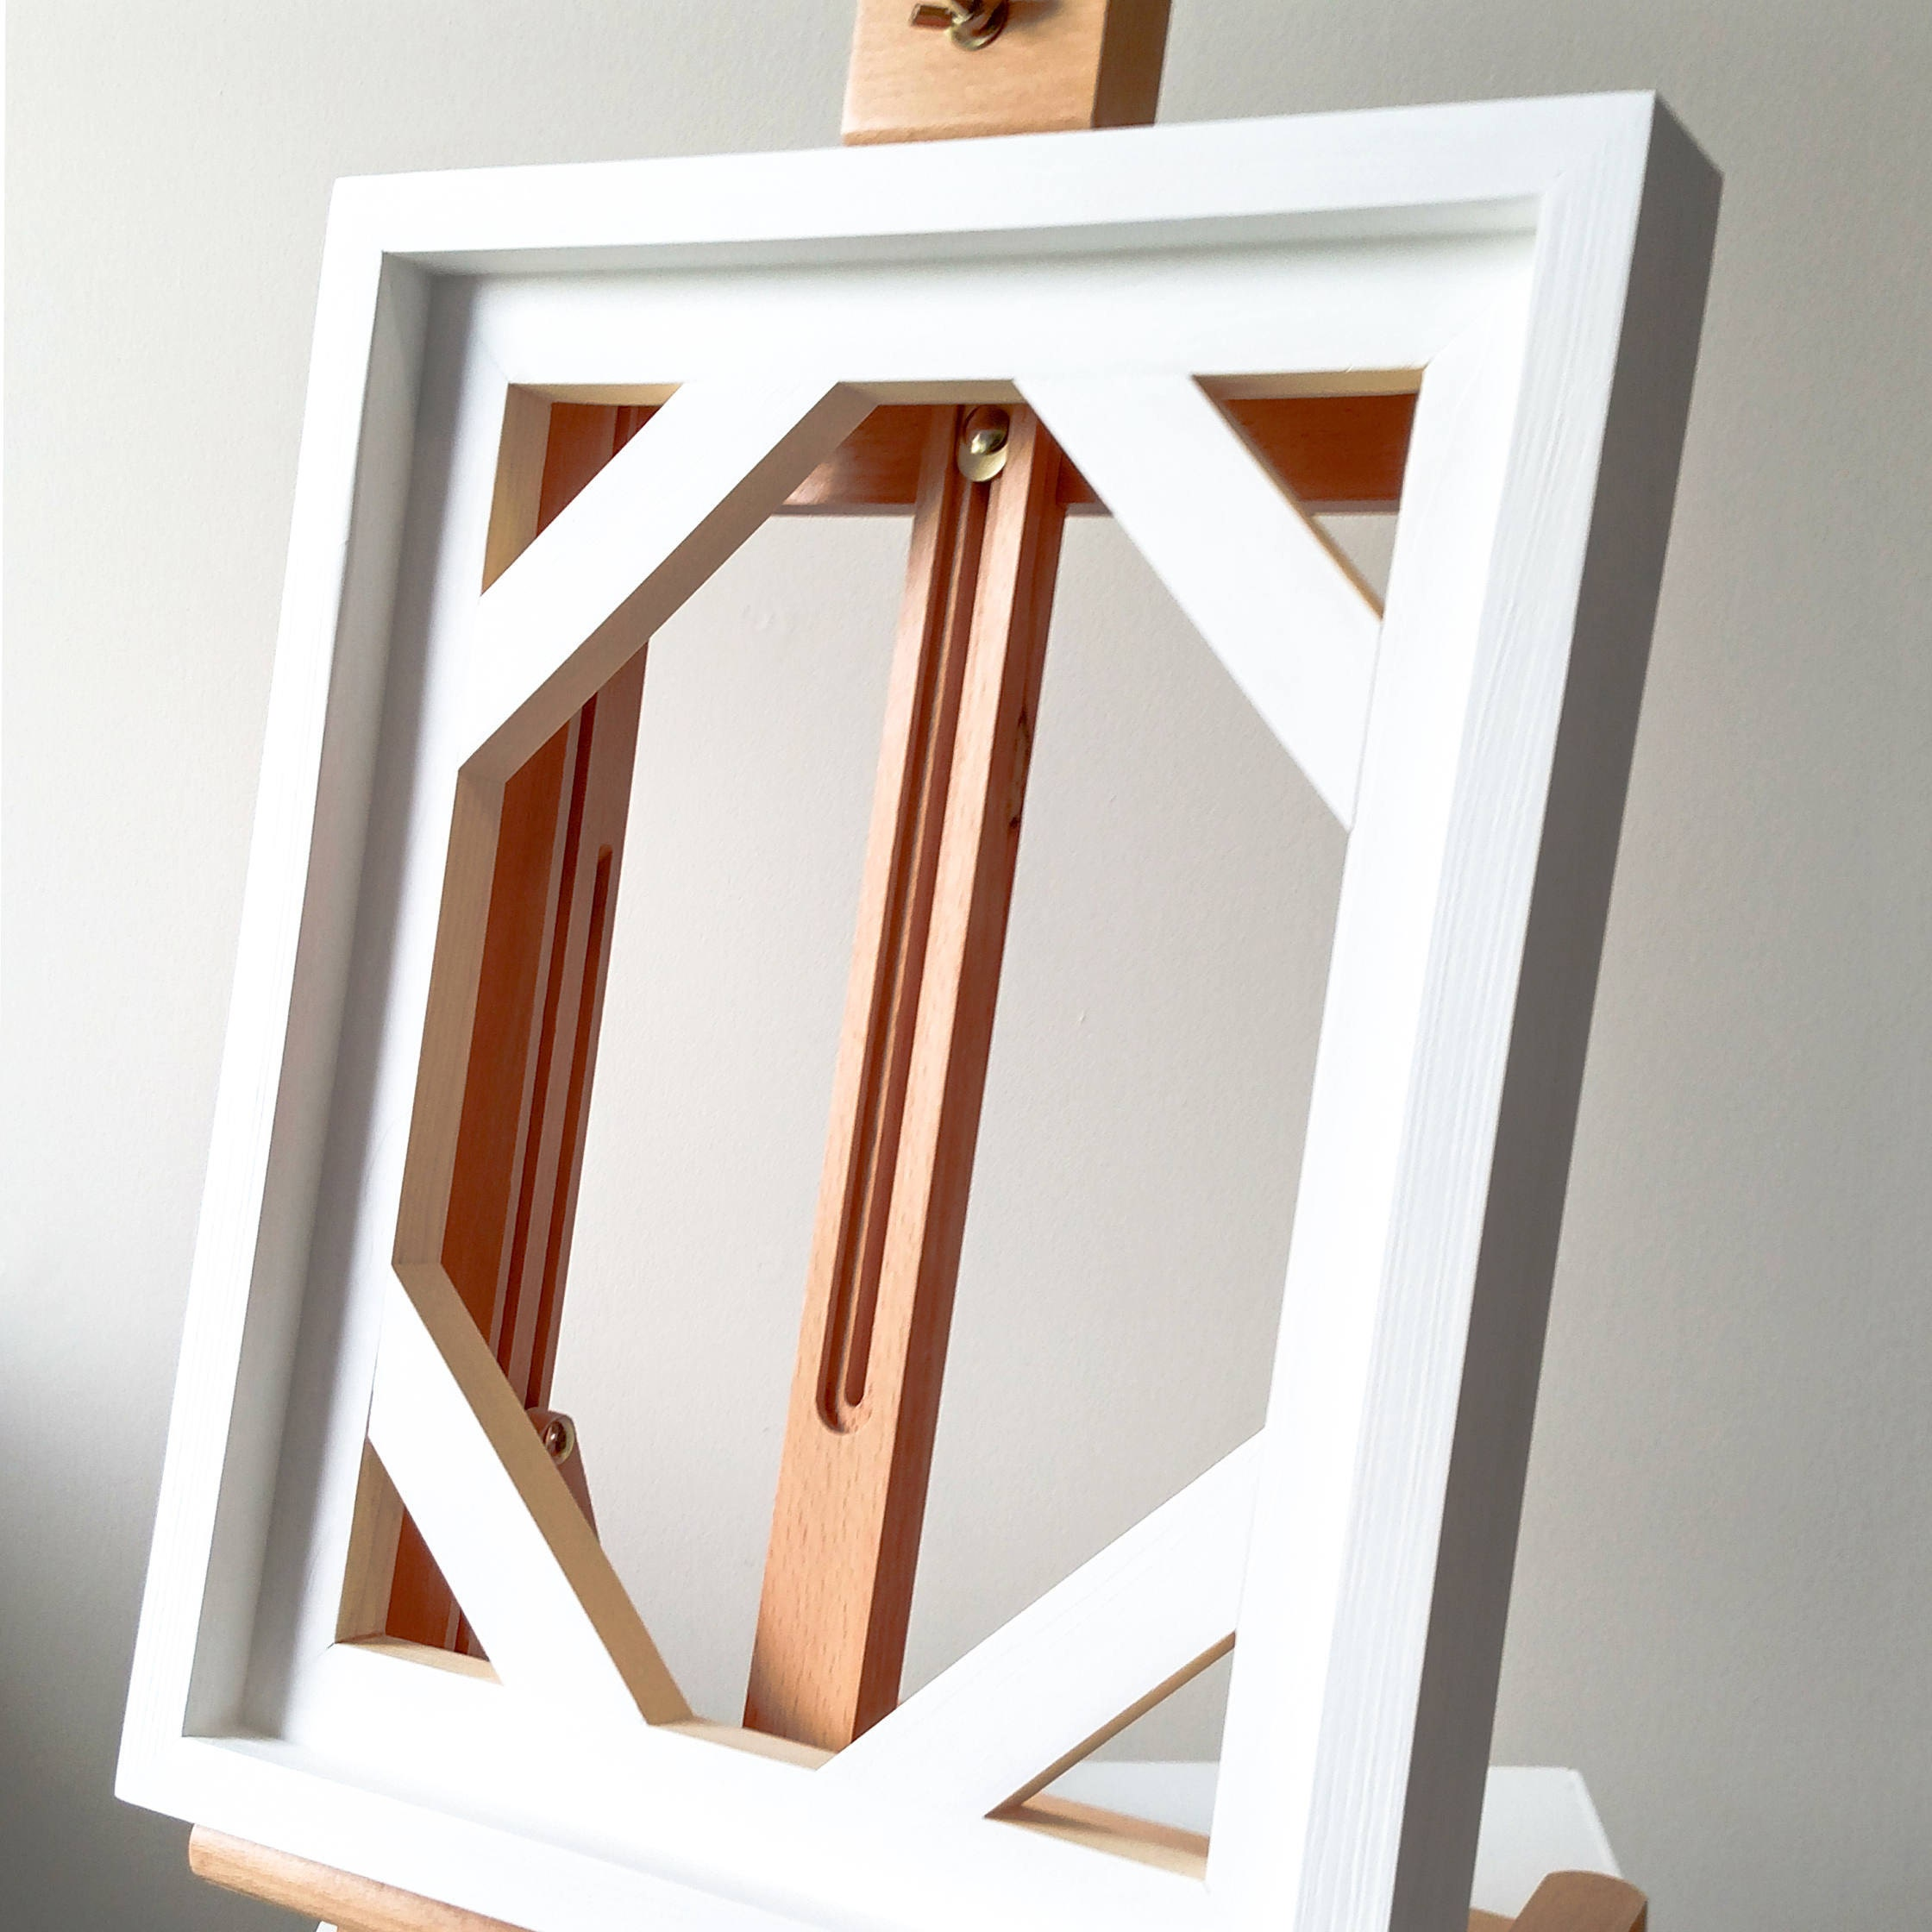 4x4 Bulk Unfinished Wood Frames Wholesale 4x4 Picture | Etsy